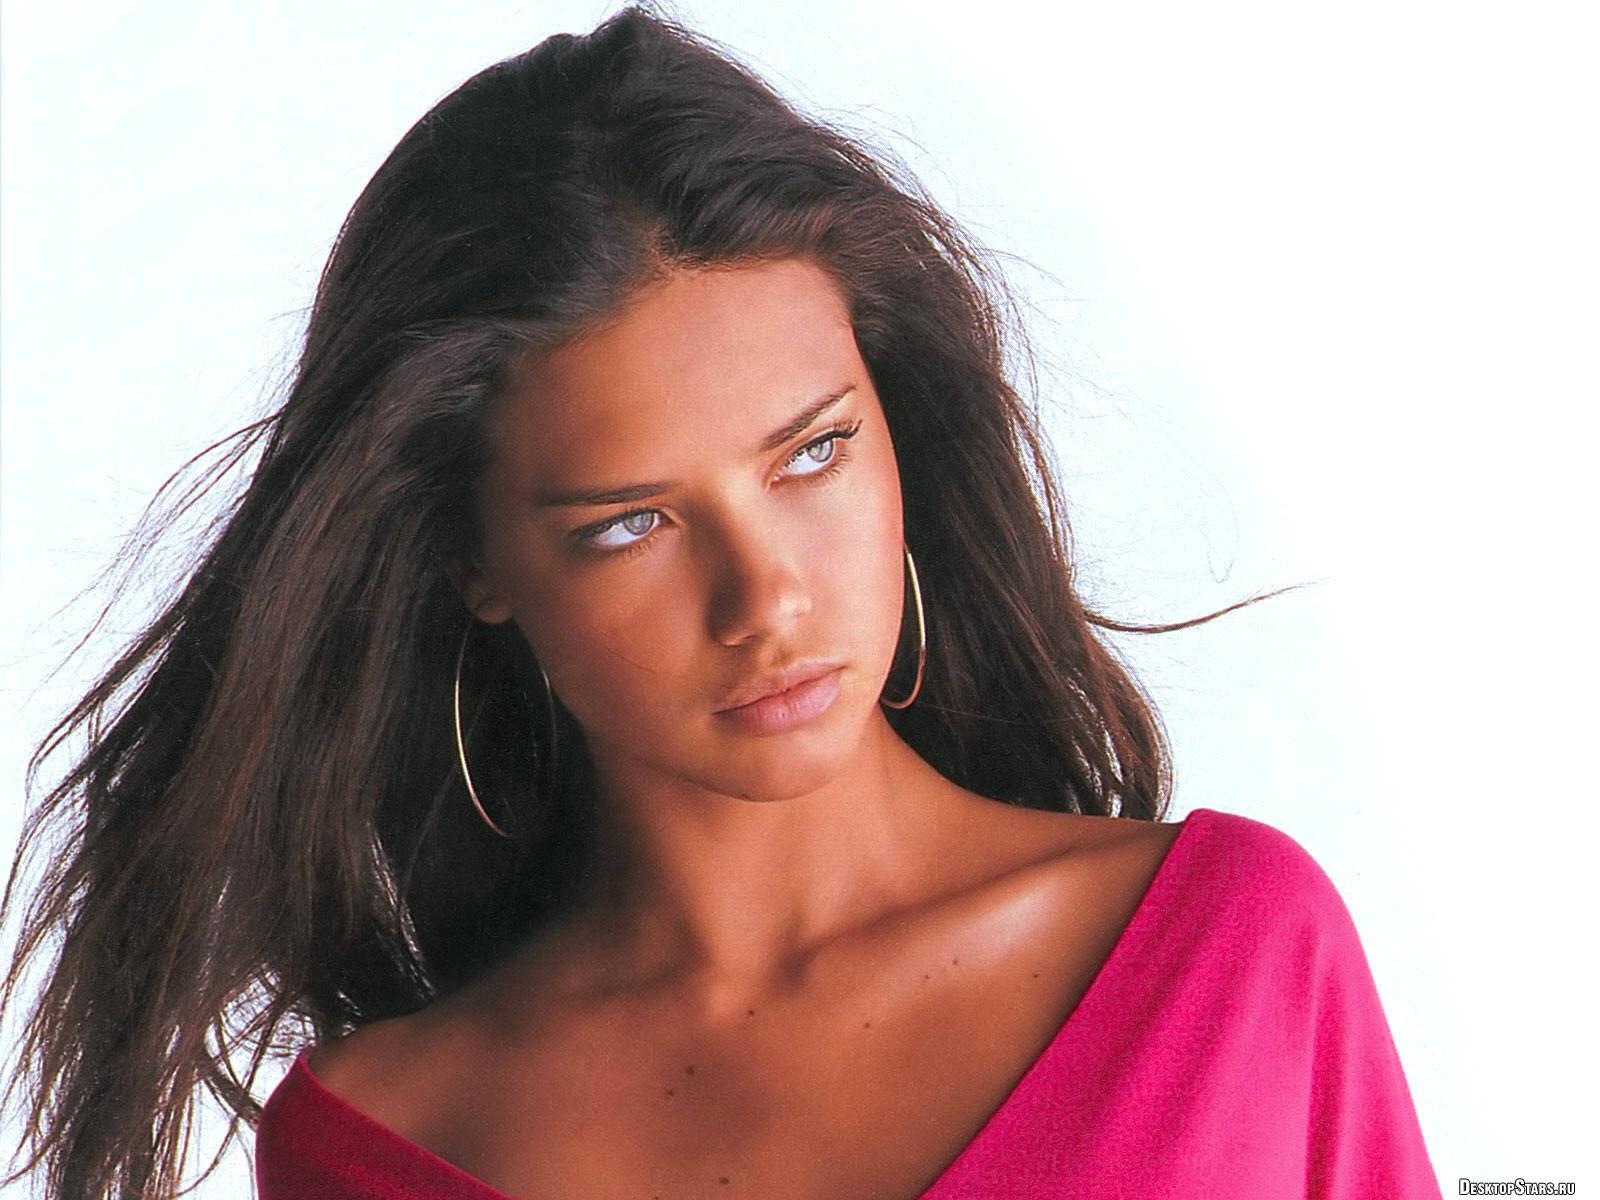 Адриана Лима  биография модели и фото